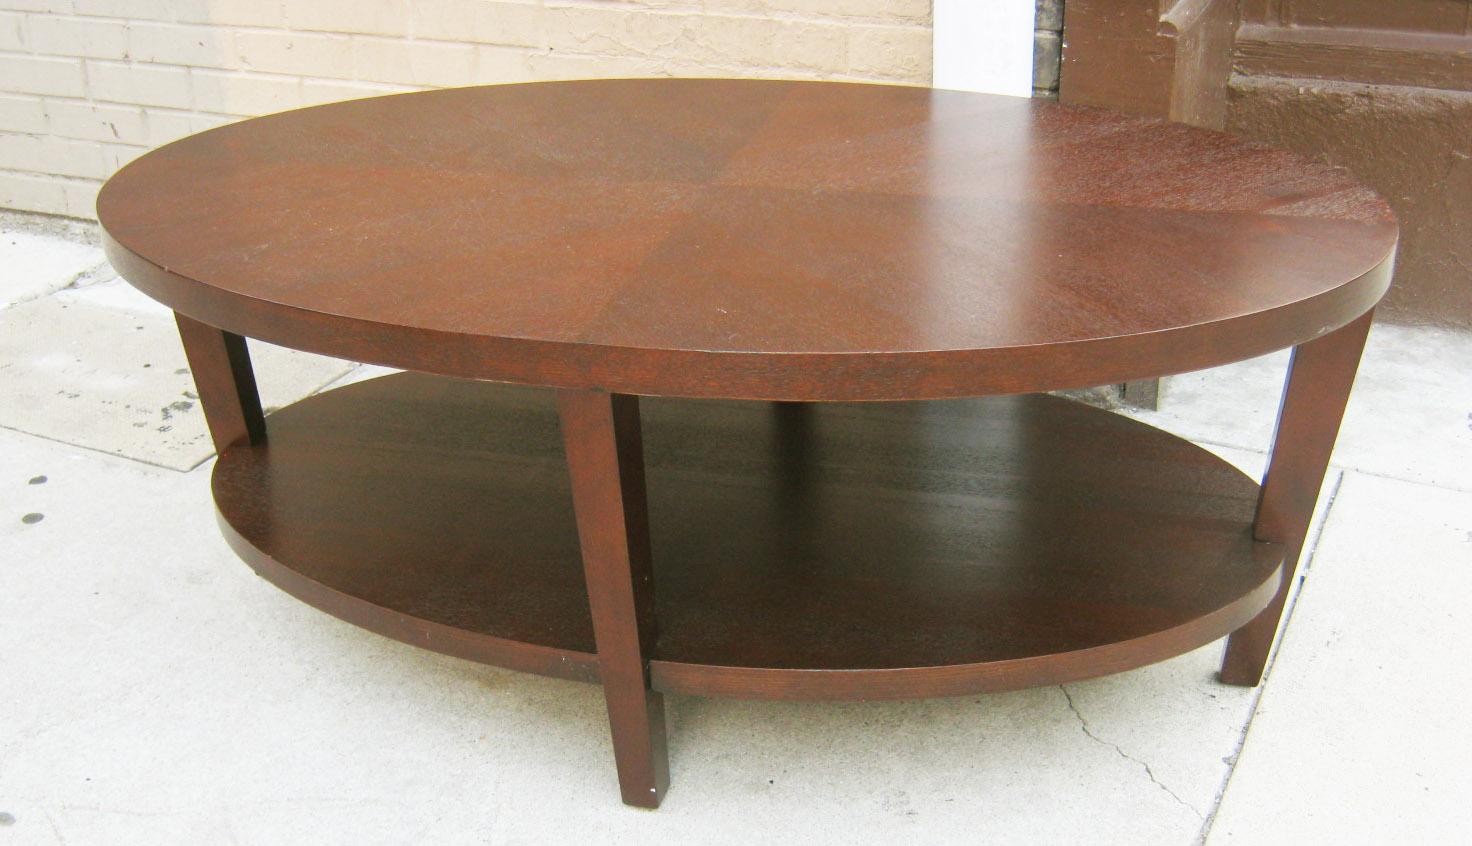 Oval Espresso Coffee Table Sold